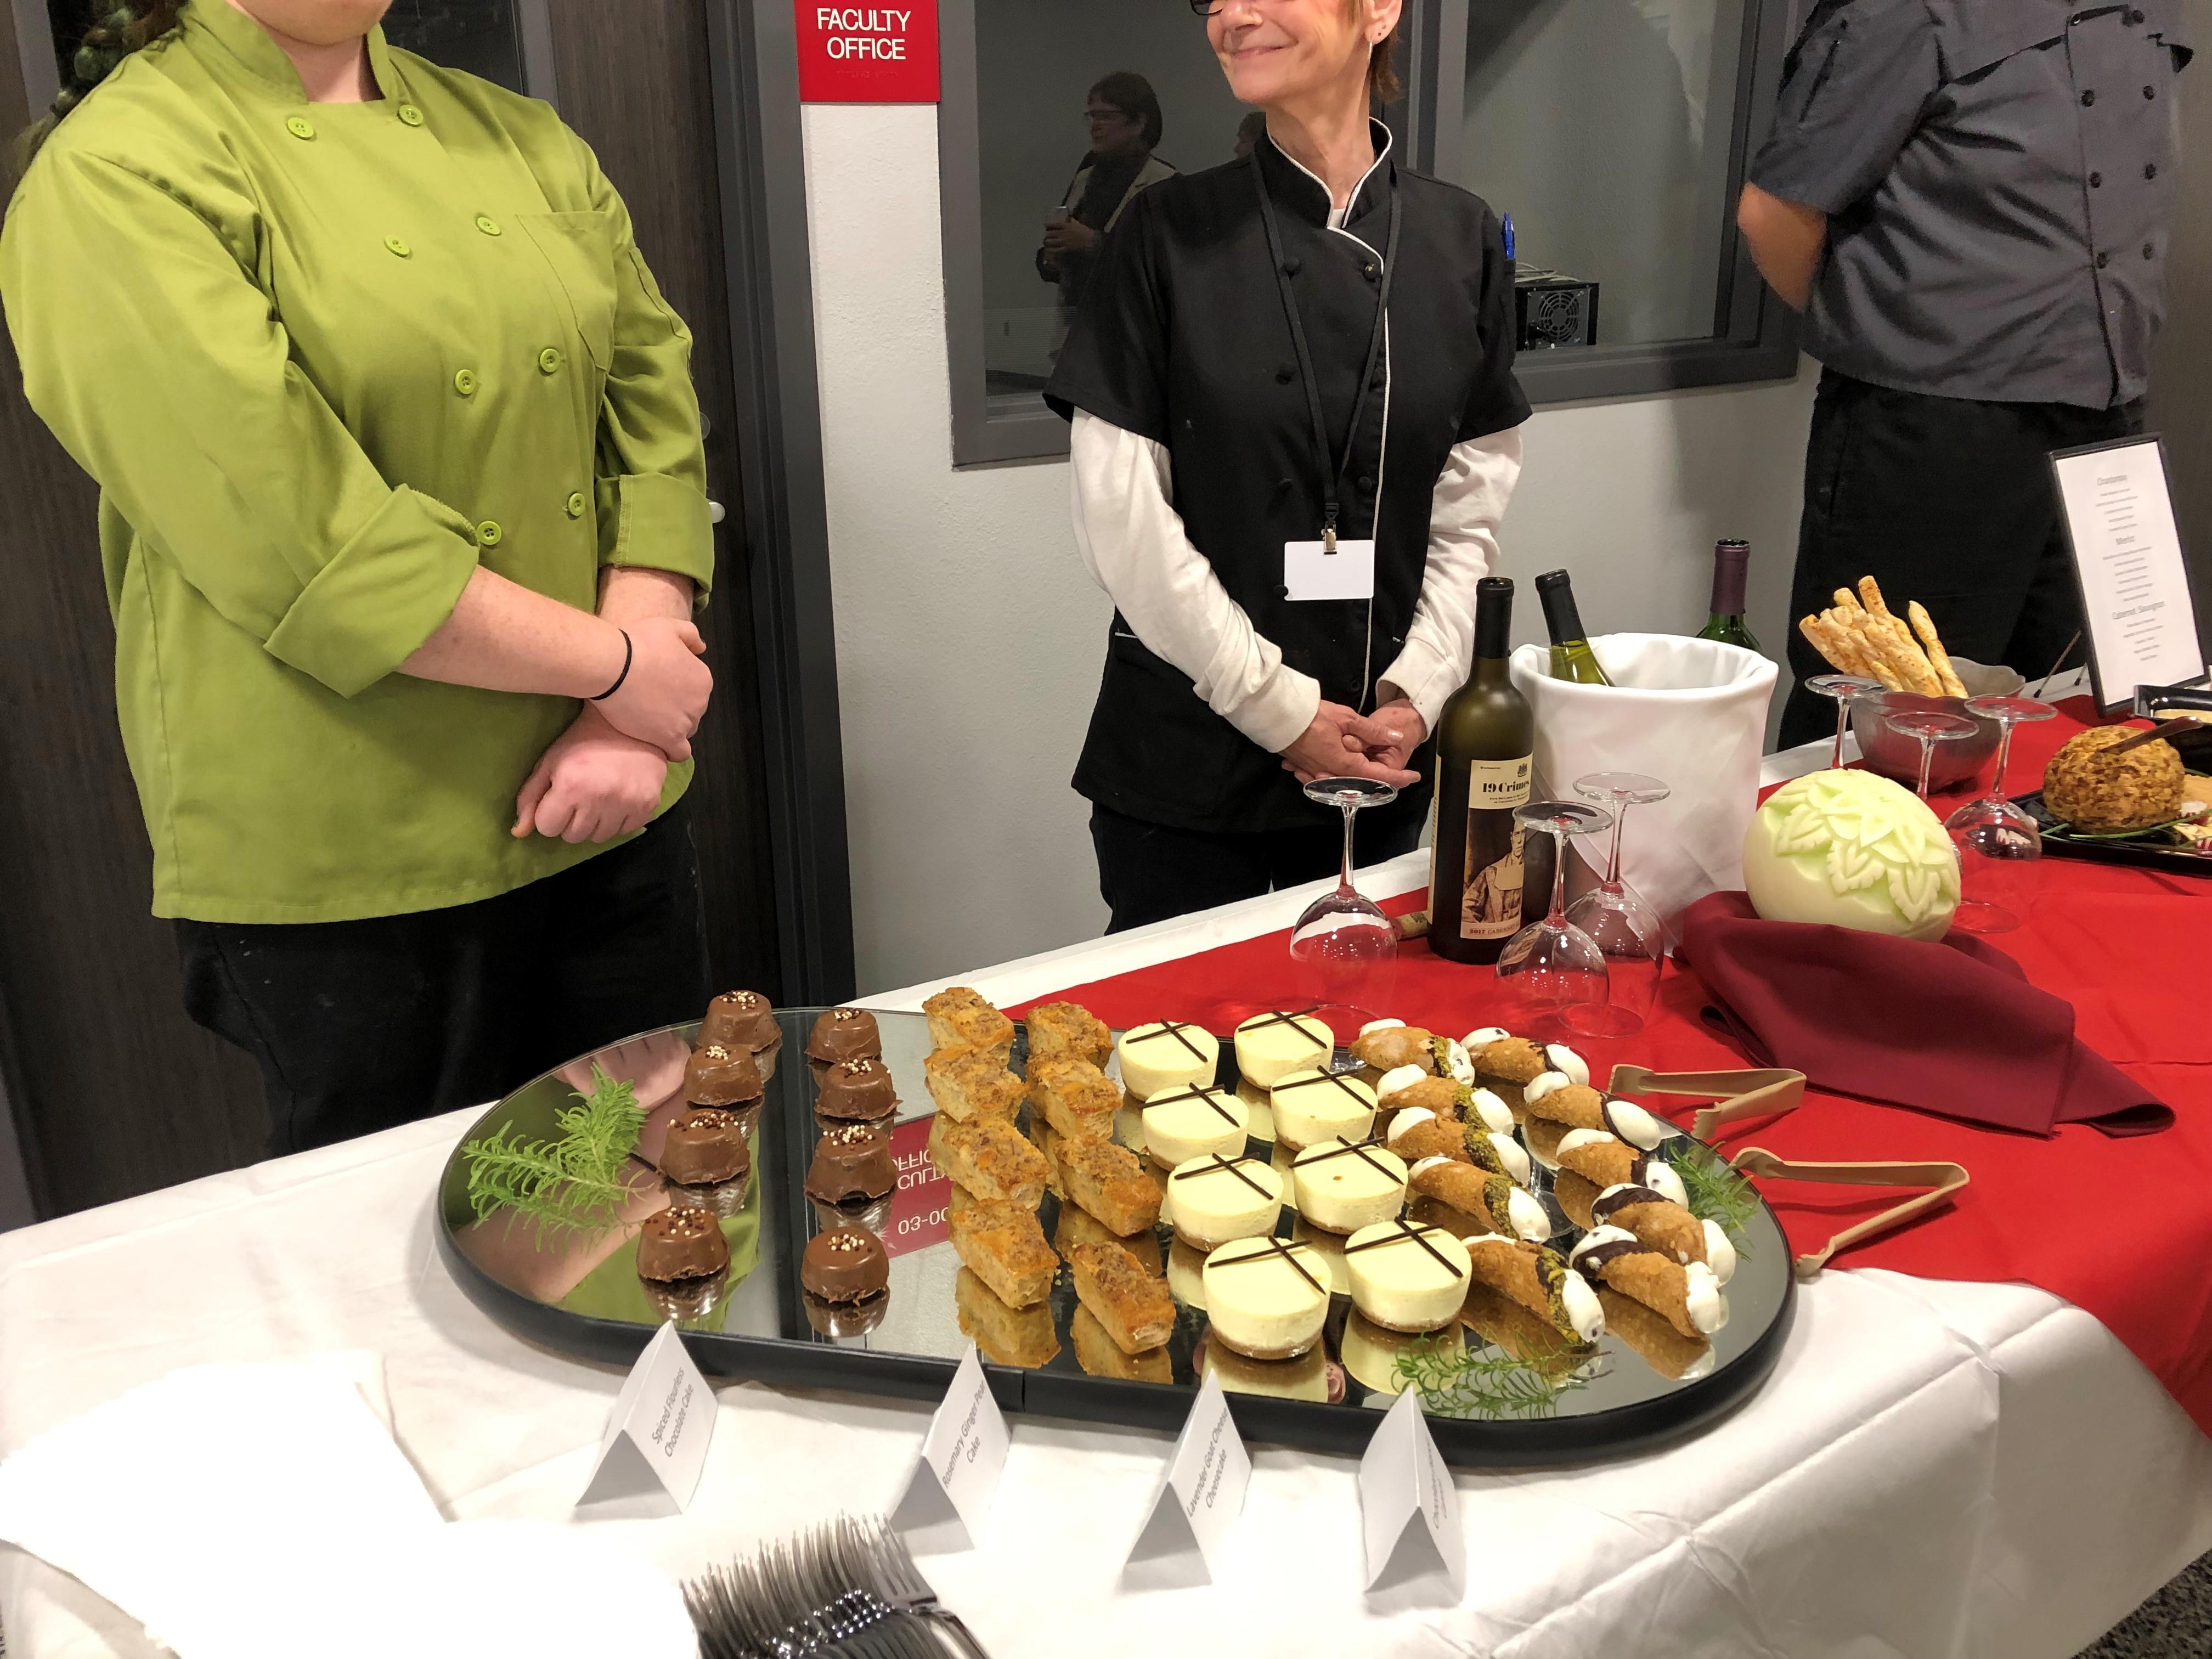 Culinary 020119 Academic Affairs 02/01/19